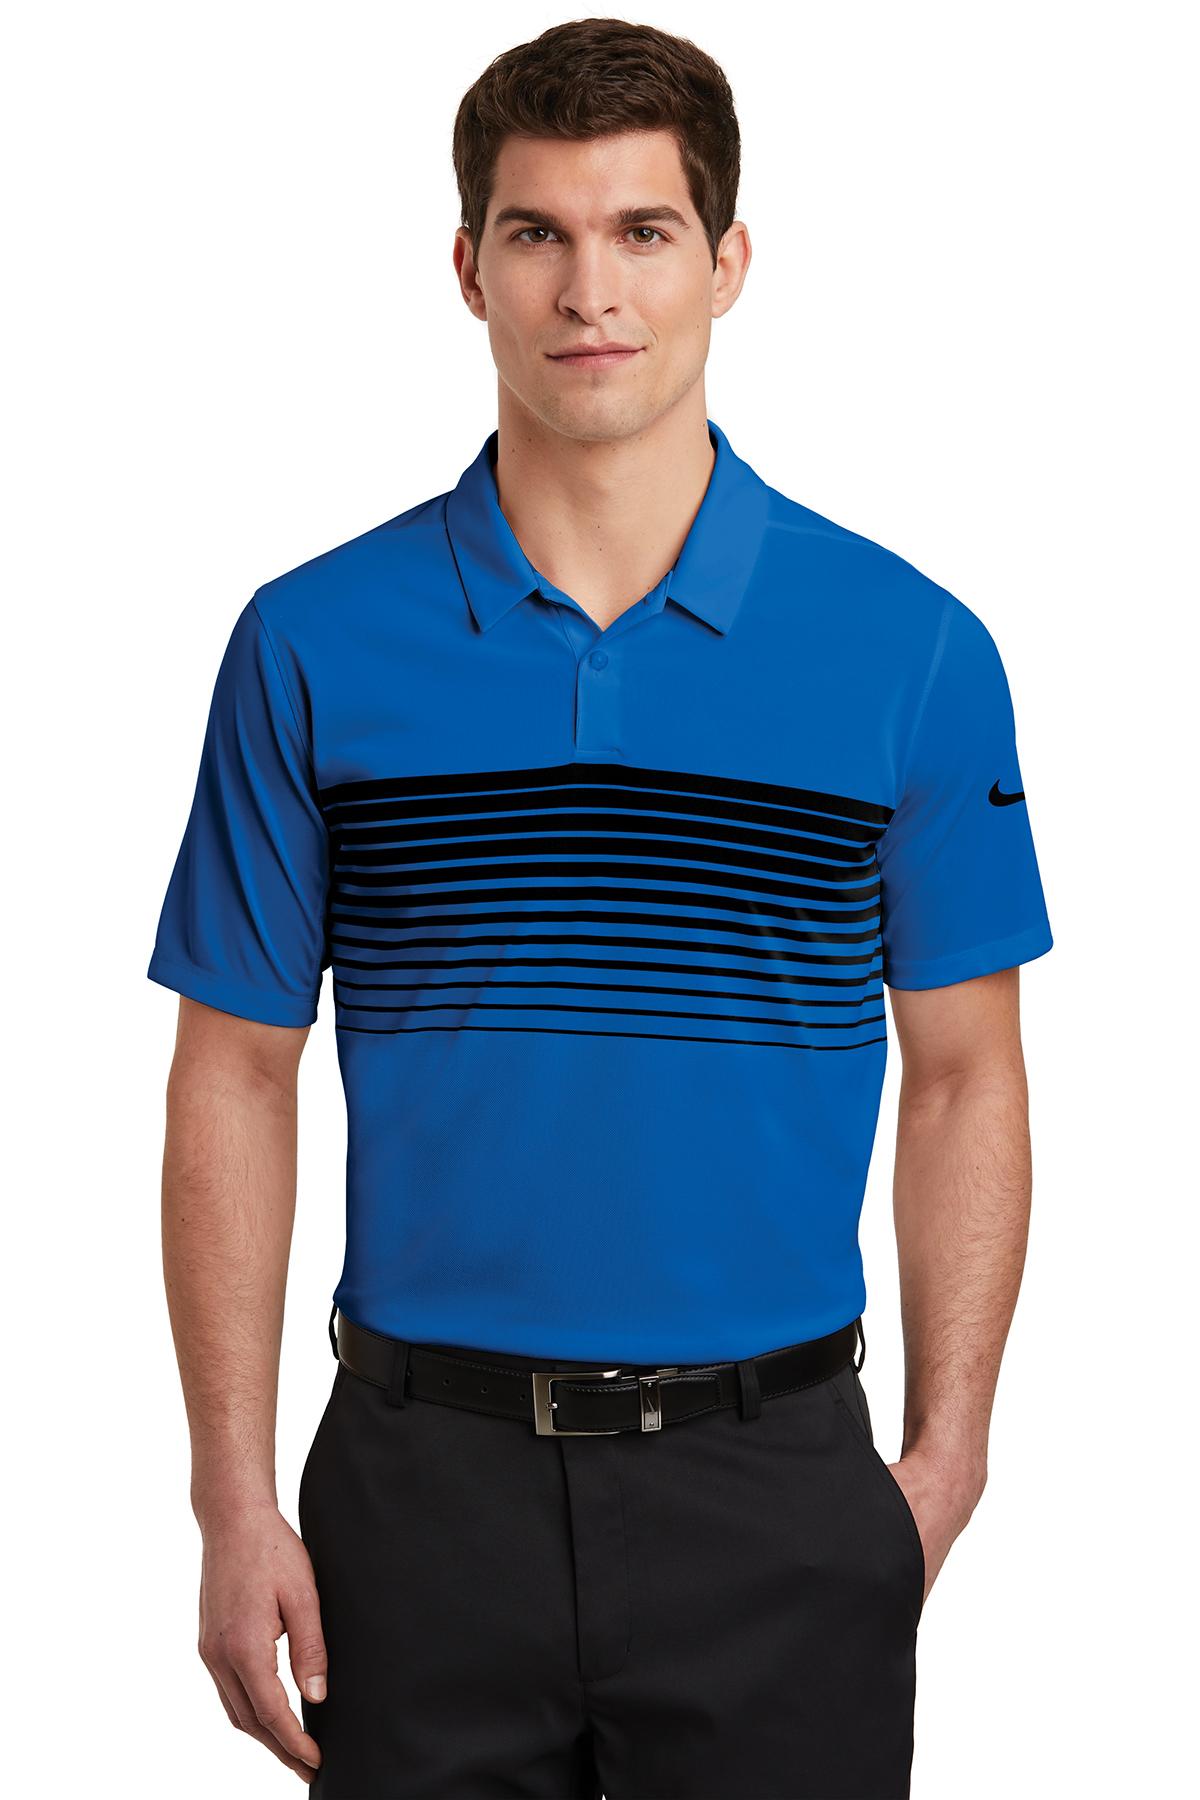 Nike Golf NKAA1855 - Nike Dri-FIT Chest Stripe Polo